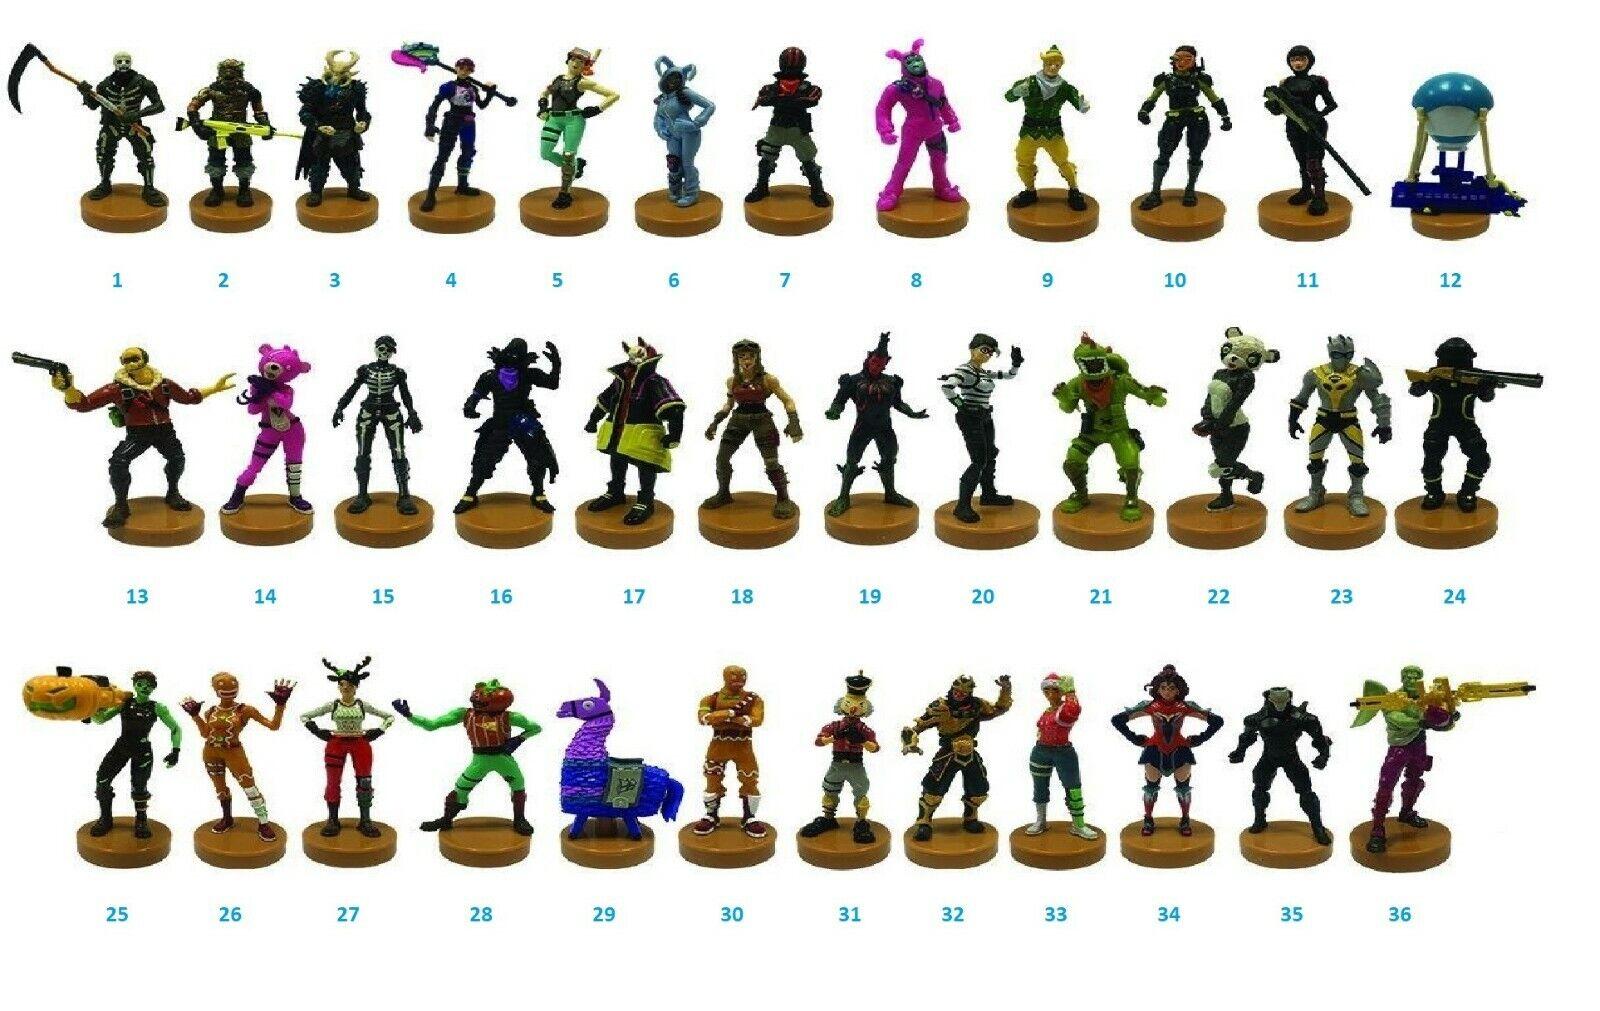 Fortnite Stampers Series 1 Modellserie Figur mit Stempel Auswahl an Figuren